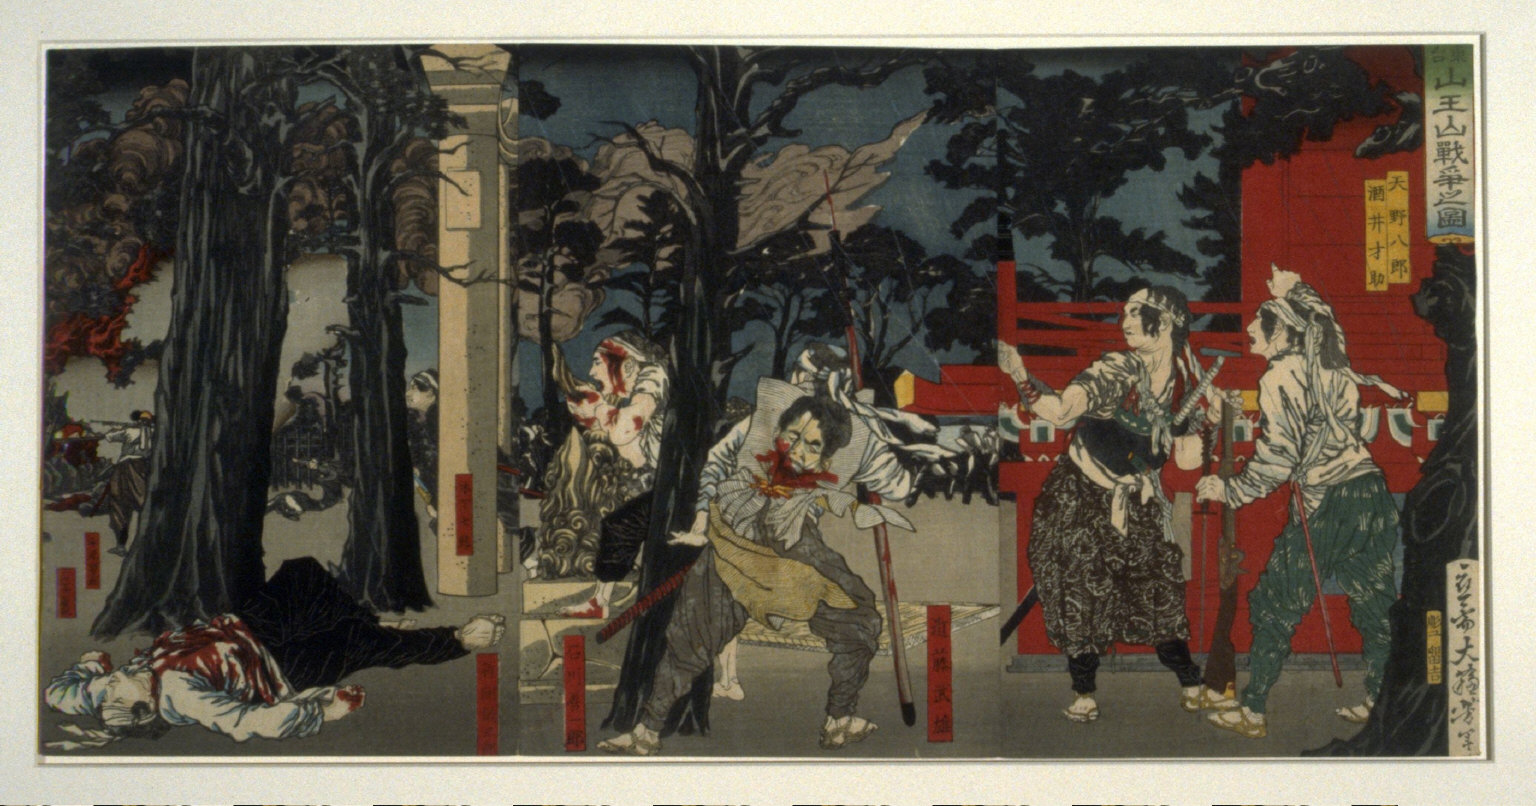 Battle of Sanno Shrine (Todai sannozan no zu)